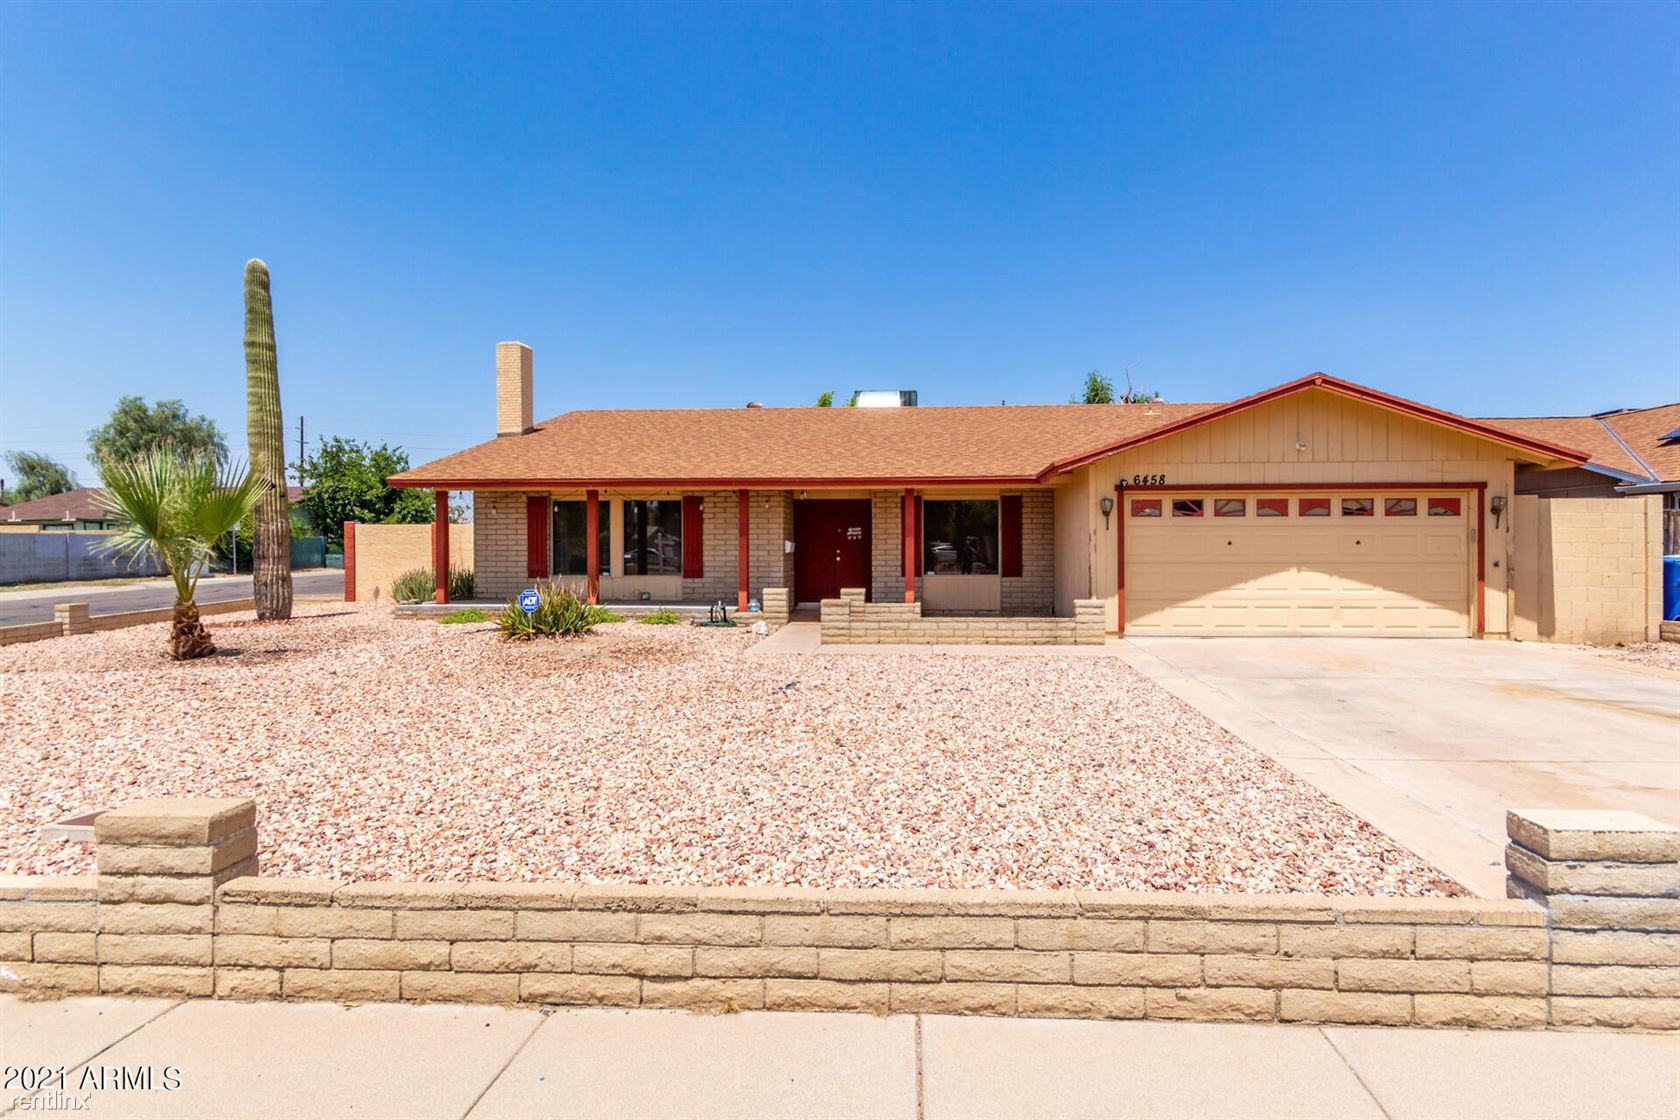 6458 W MARIPOSA Street, Phoenix, AZ - 2,995 USD/ month